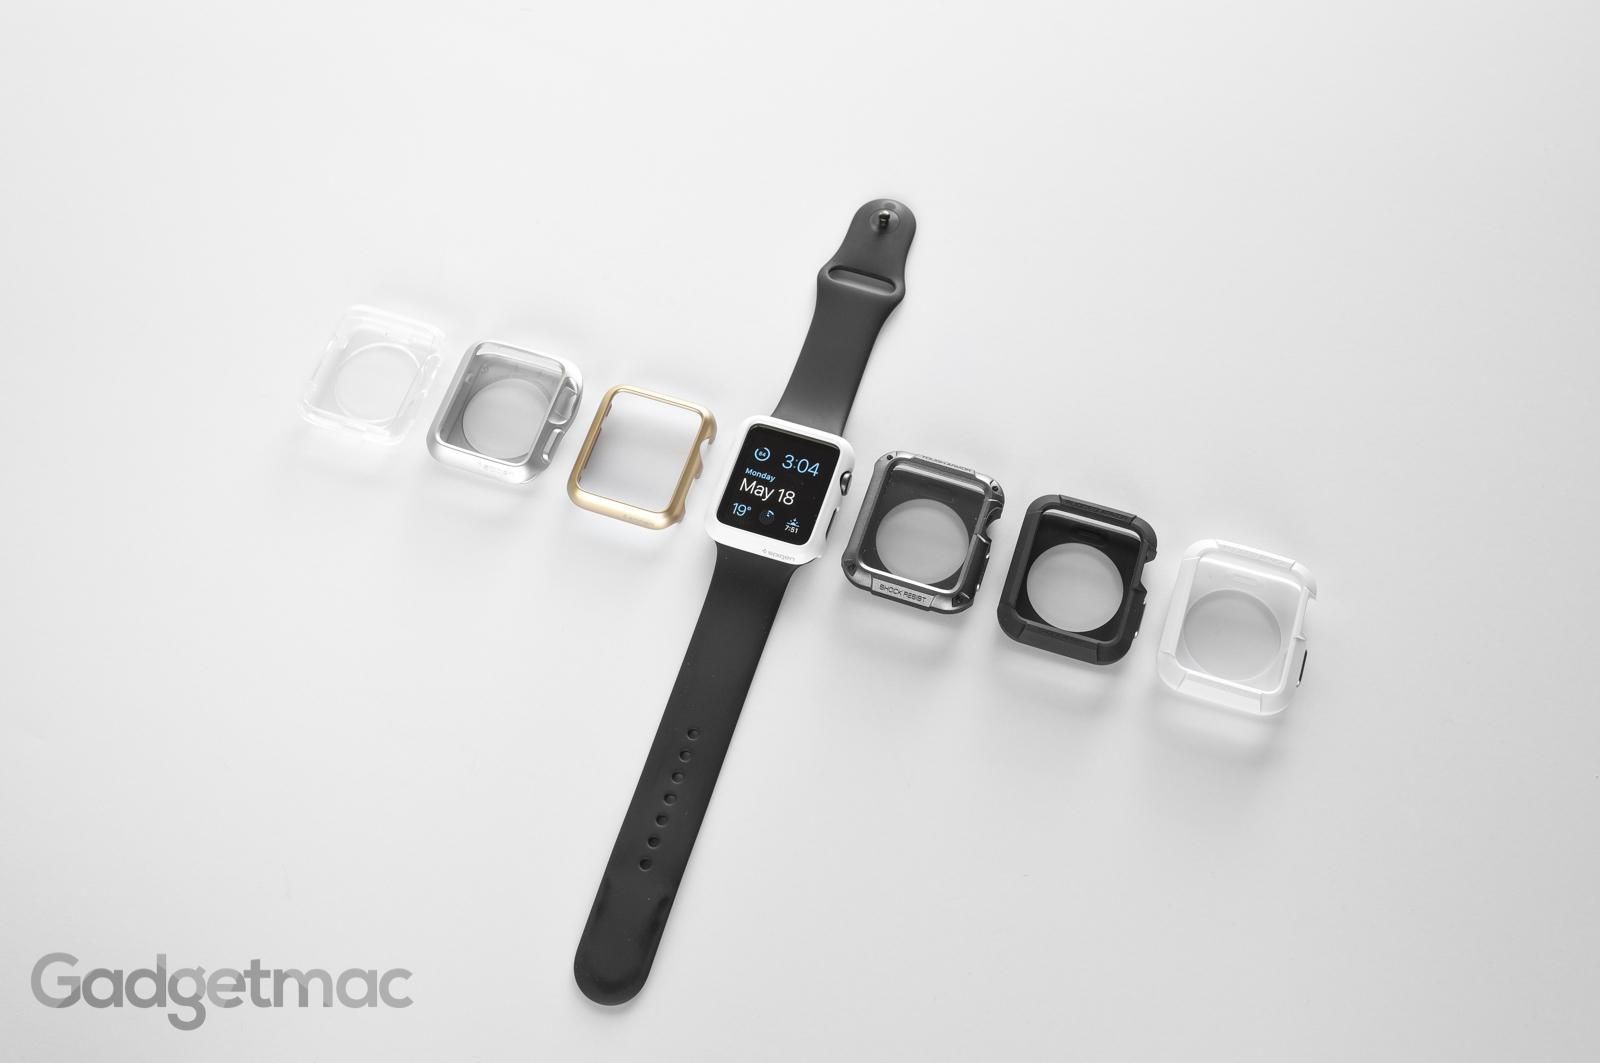 spigen-apple-watch-cases-1.jpg